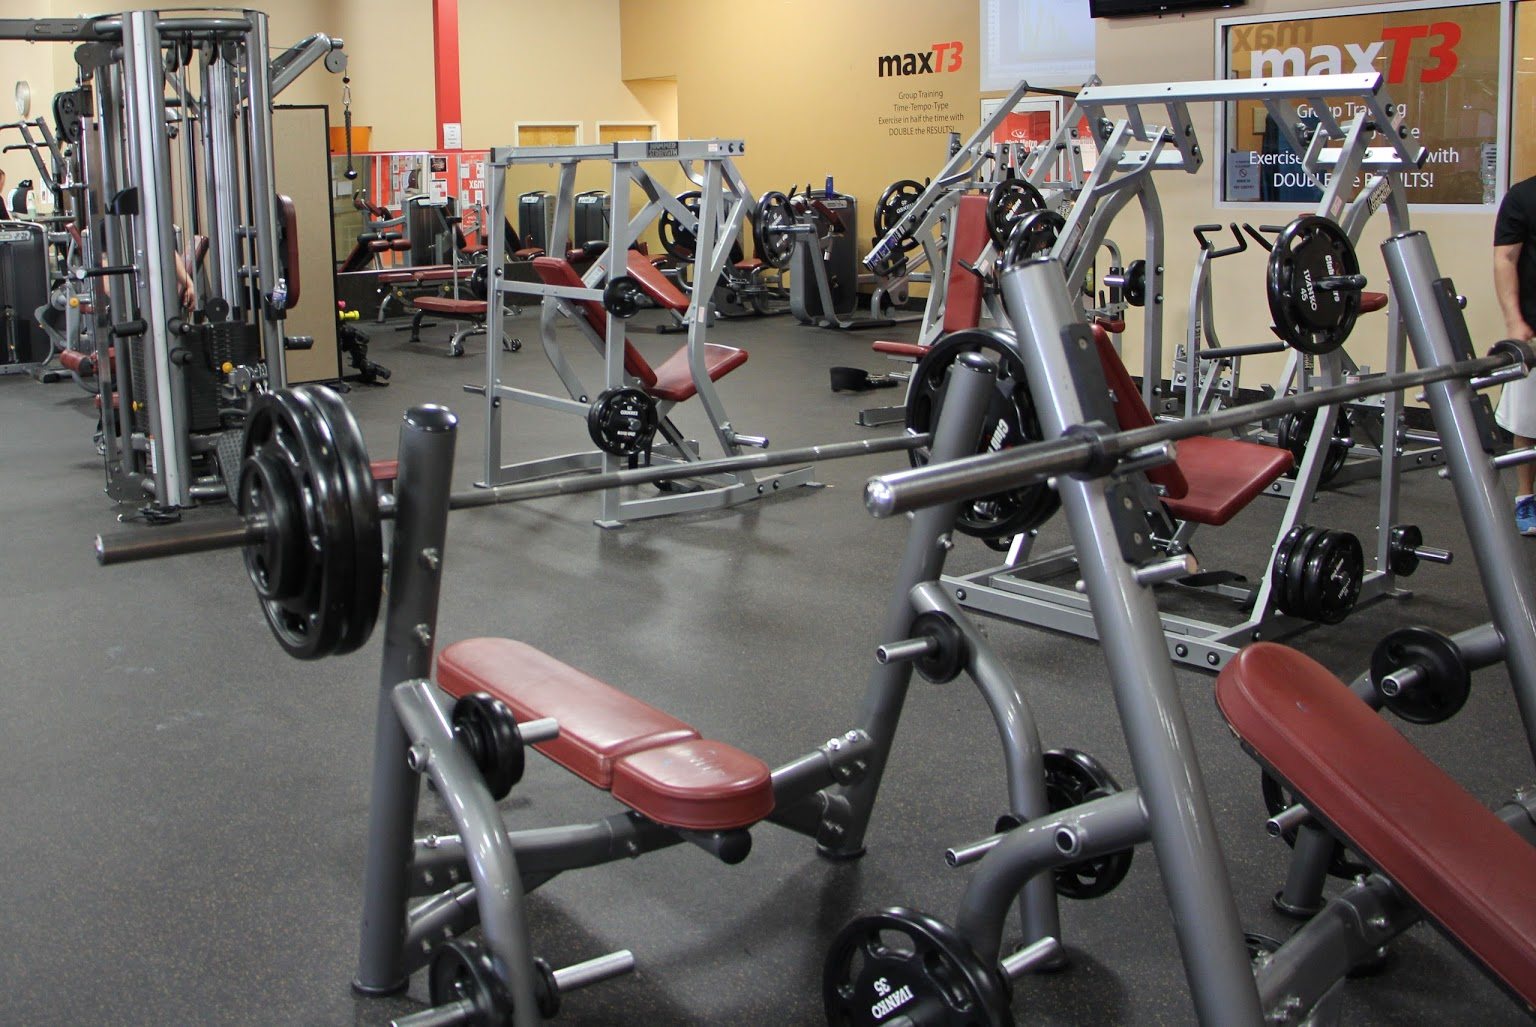 weights Club Metro USA Fitness Center Phillipsburg NJ